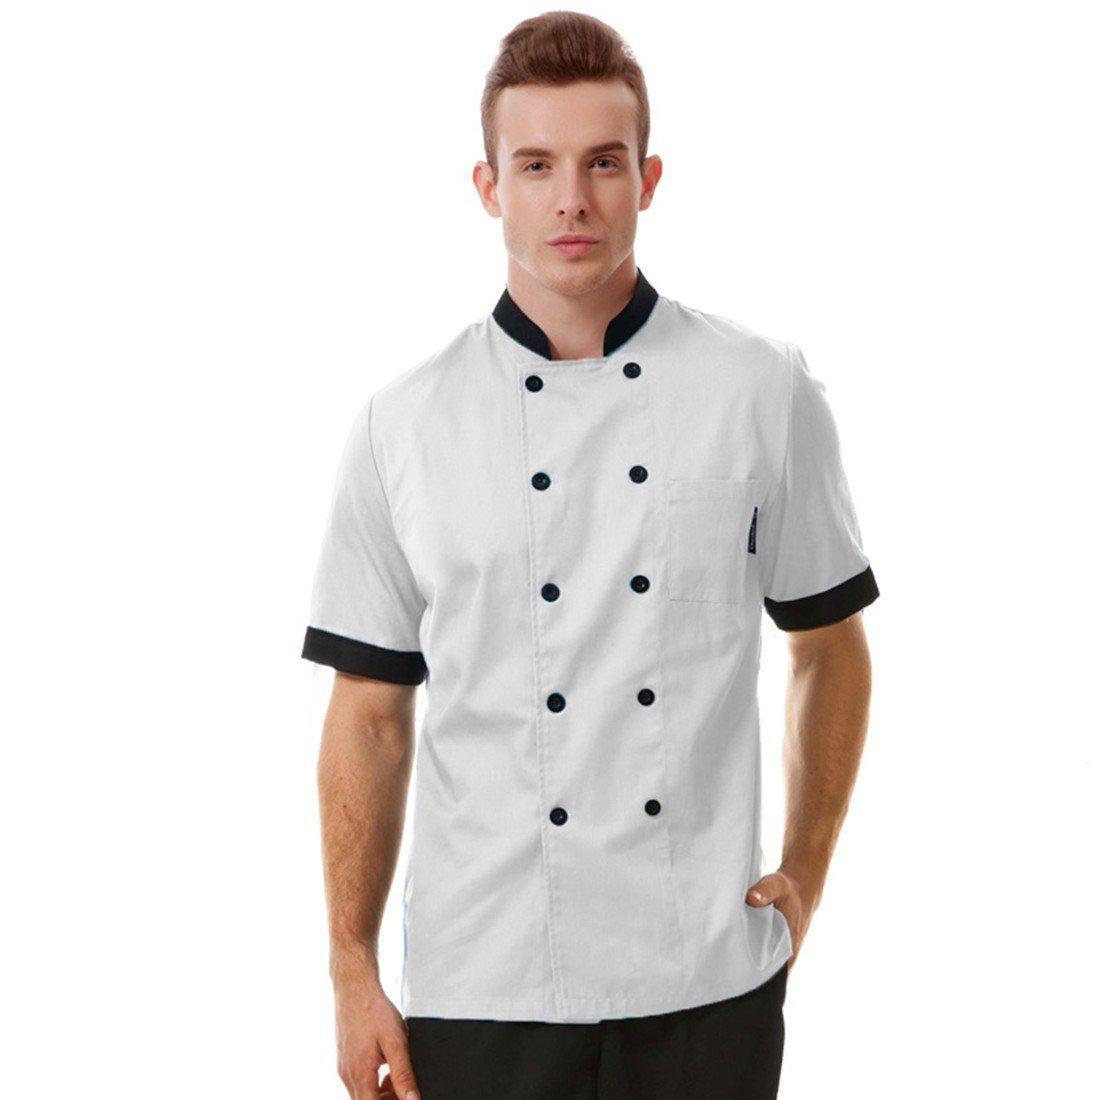 Long Sleeve Classic Kitchen Cook Chef Waiter Waitress Coat Uniform Jacket Black Bright In Colour Uniforms & Aprons Business & Industrial